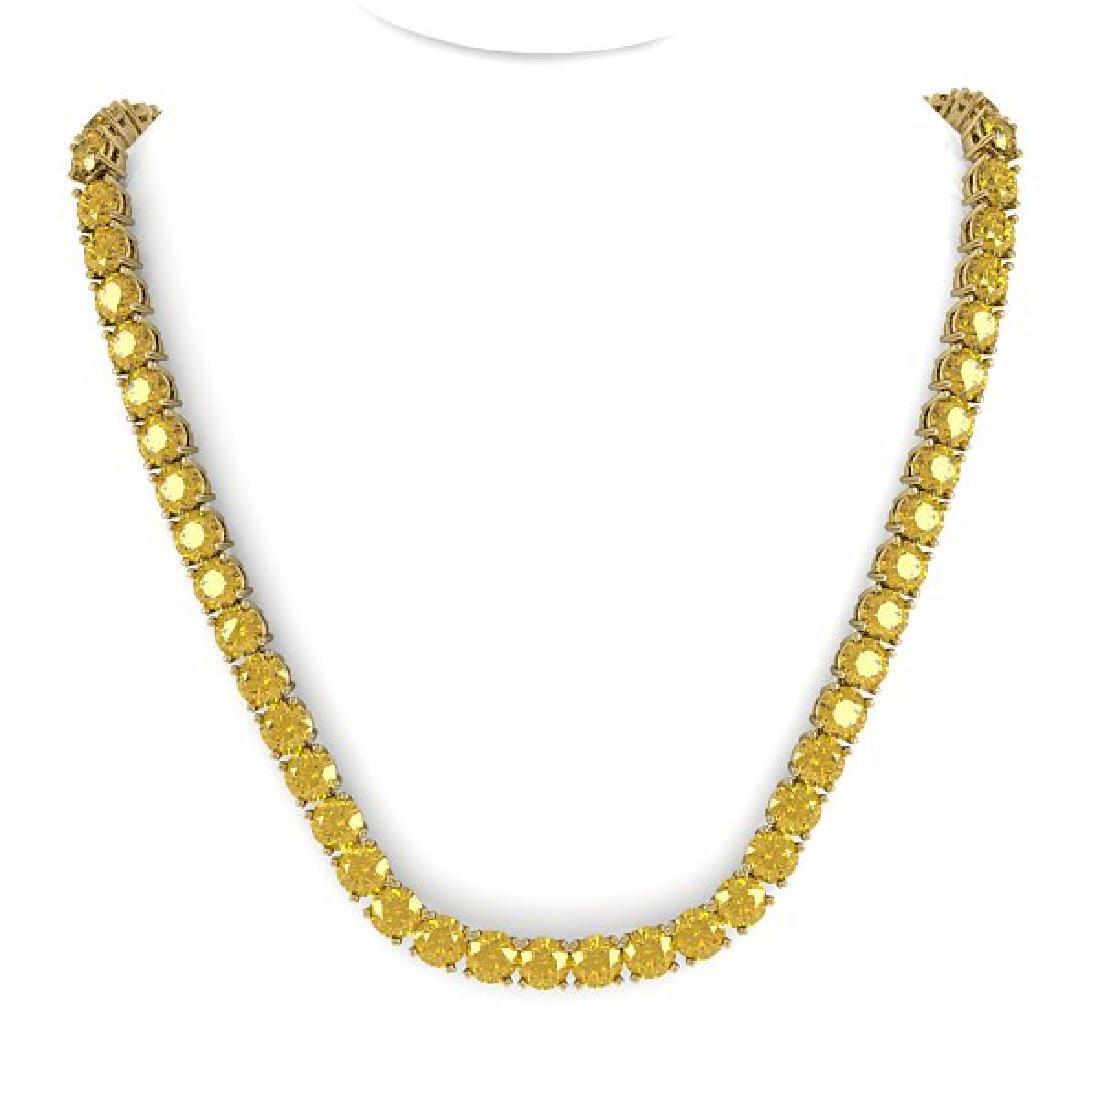 30 CTW Certified Fancy Yellow SI Diamond Necklace 14K - 3